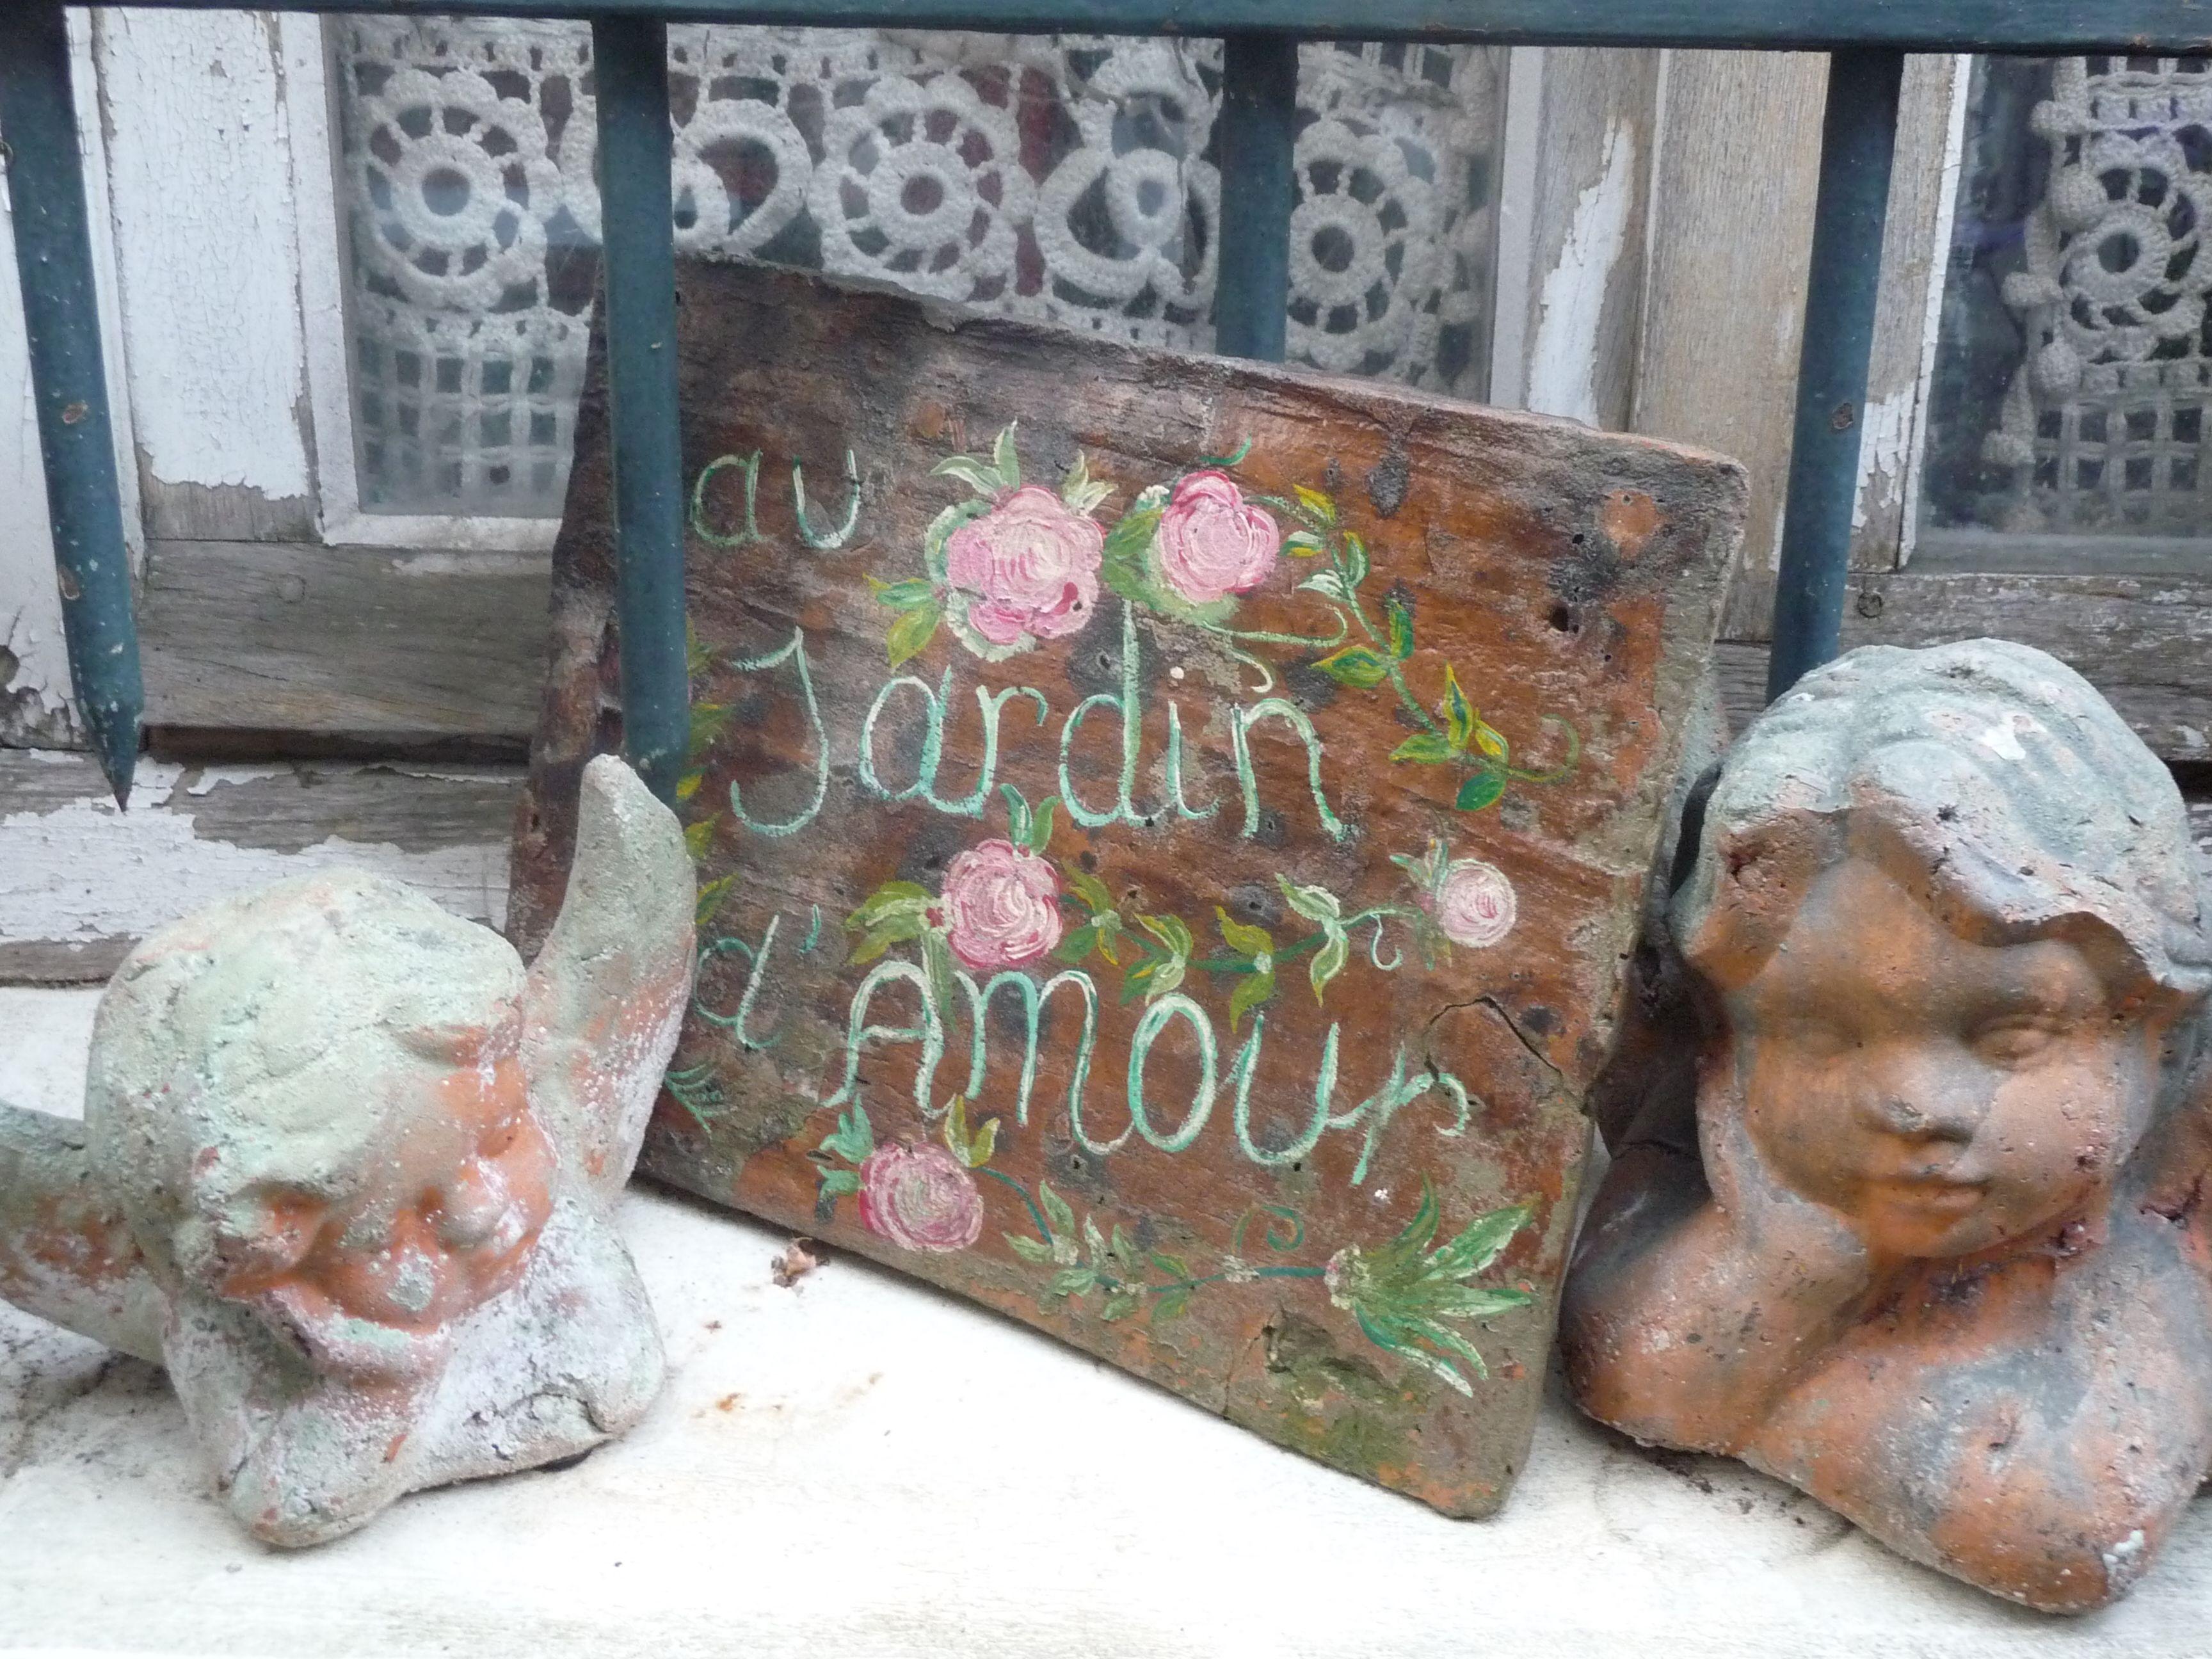 Au jardin d'amour